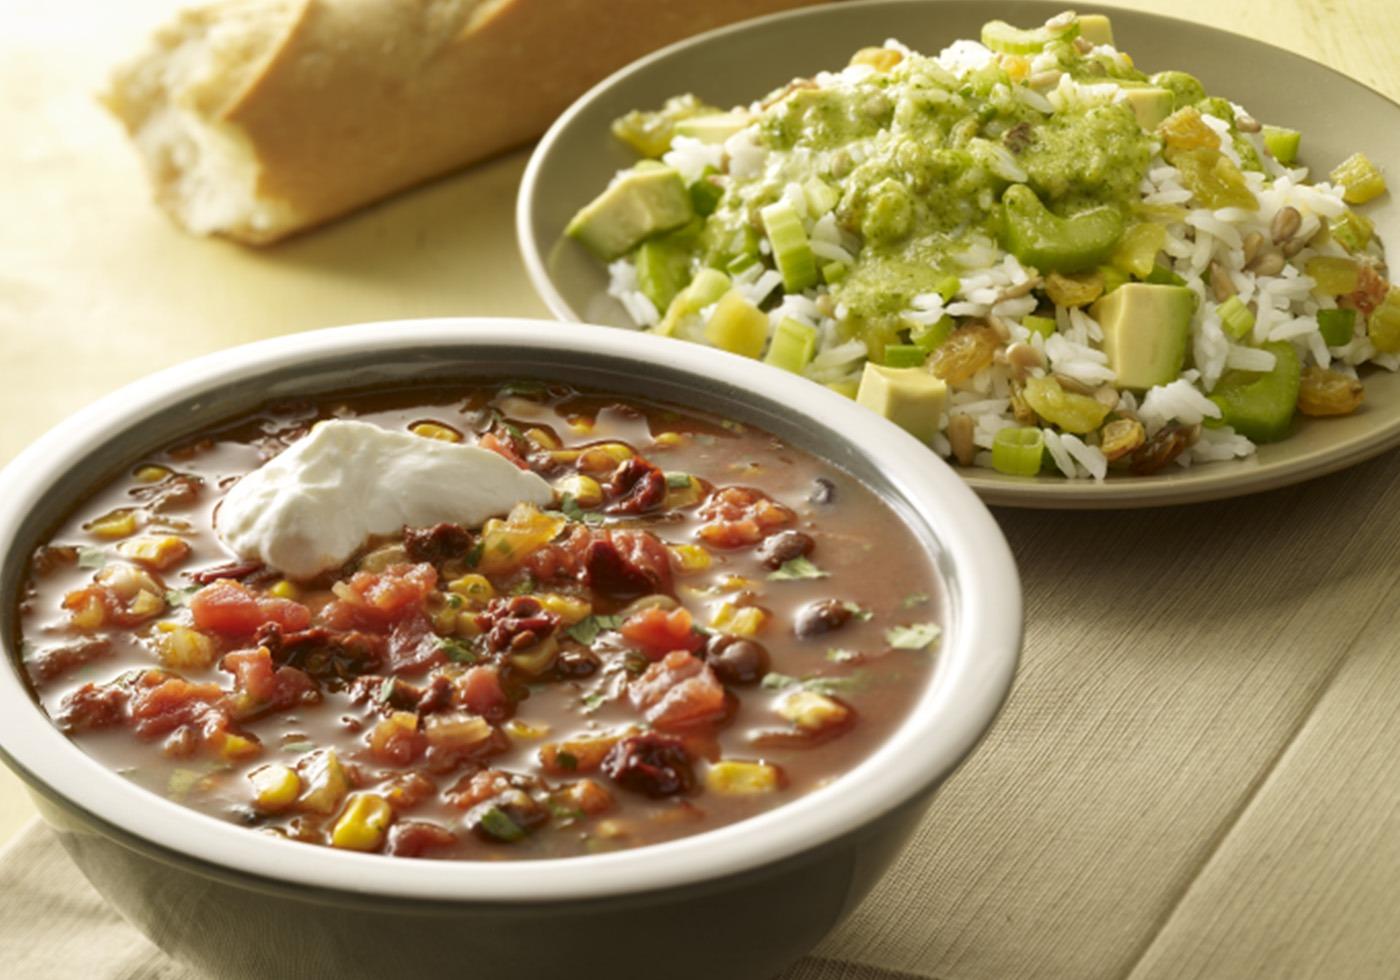 Herdez salsa embasa chipotle chili combo